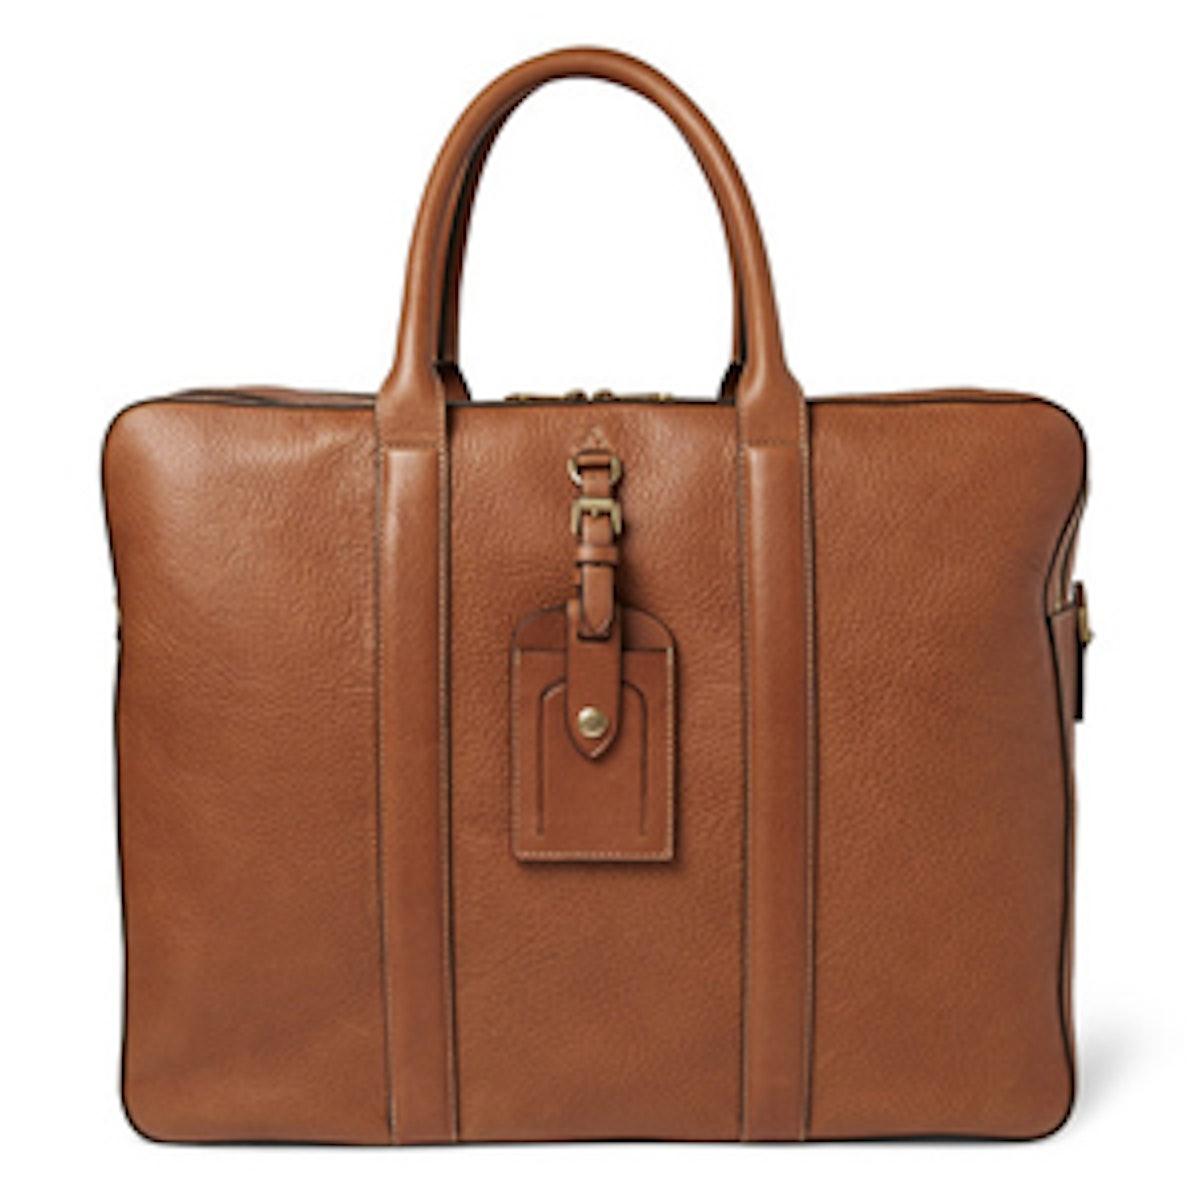 Matthew Leather 24-Hour Bag